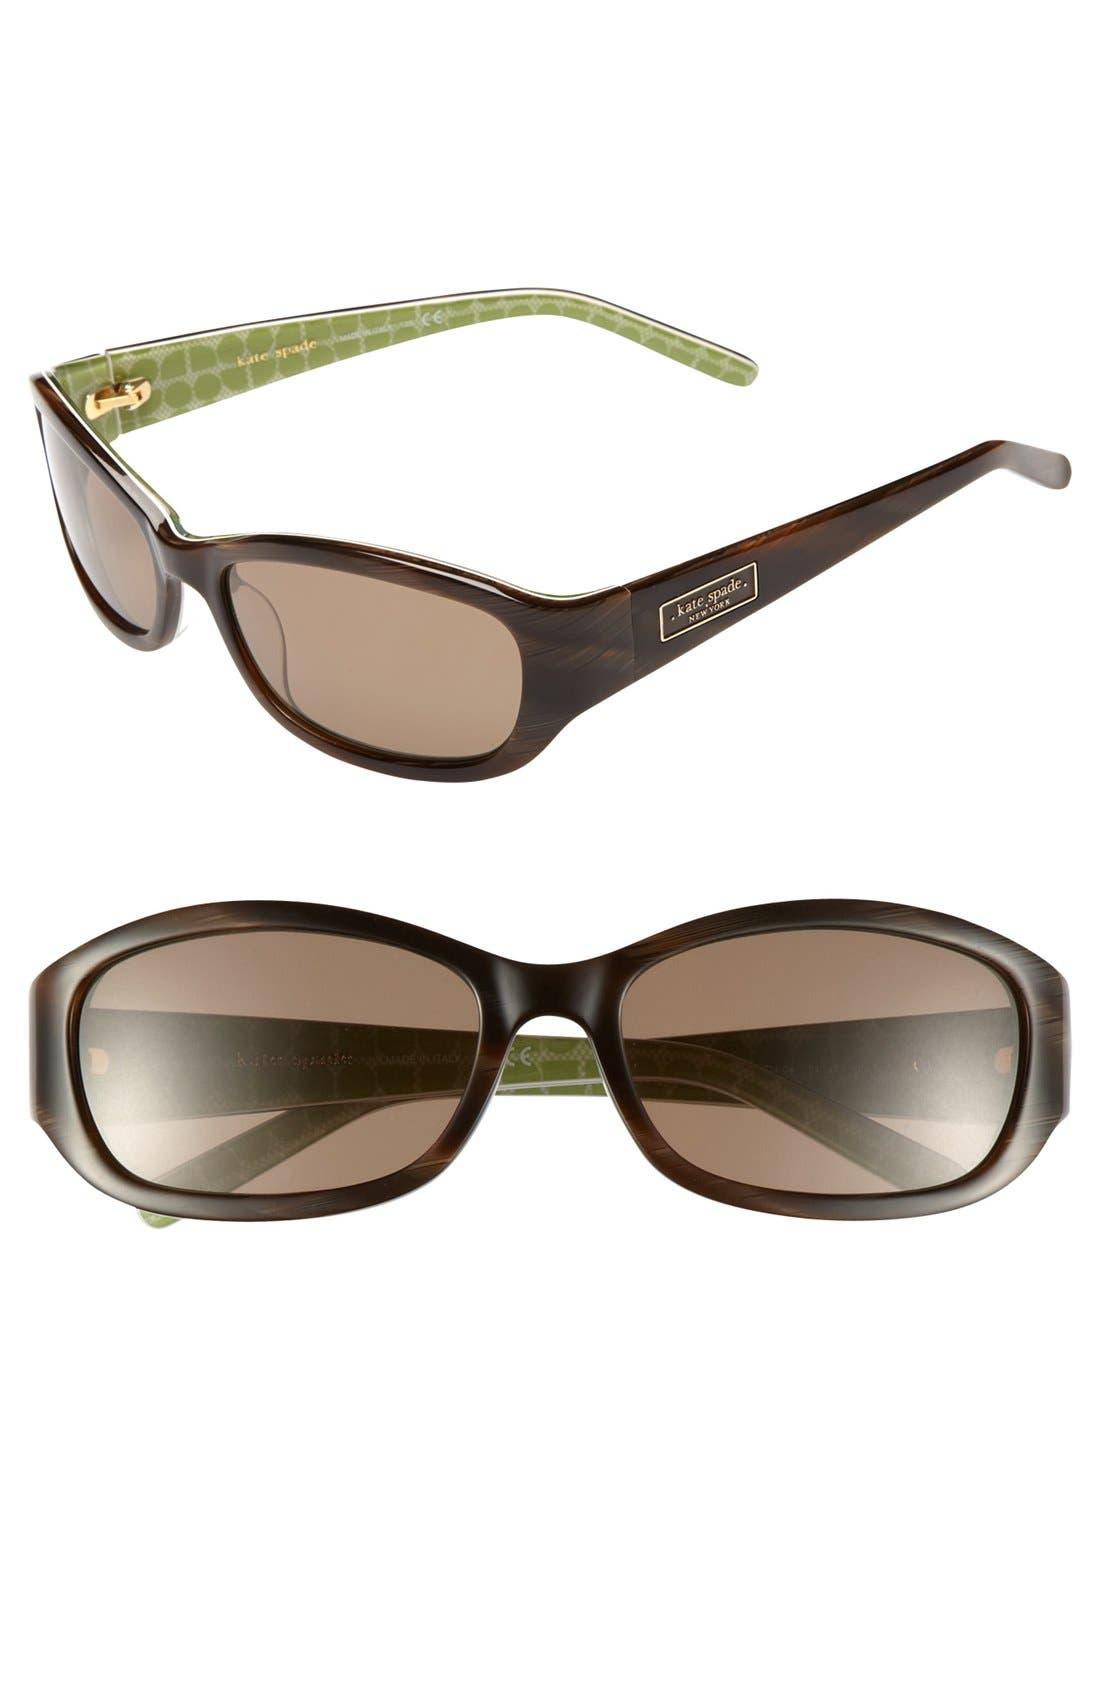 Alternate Image 1 Selected - kate spade 'dee' two-tone 54mm sunglasses